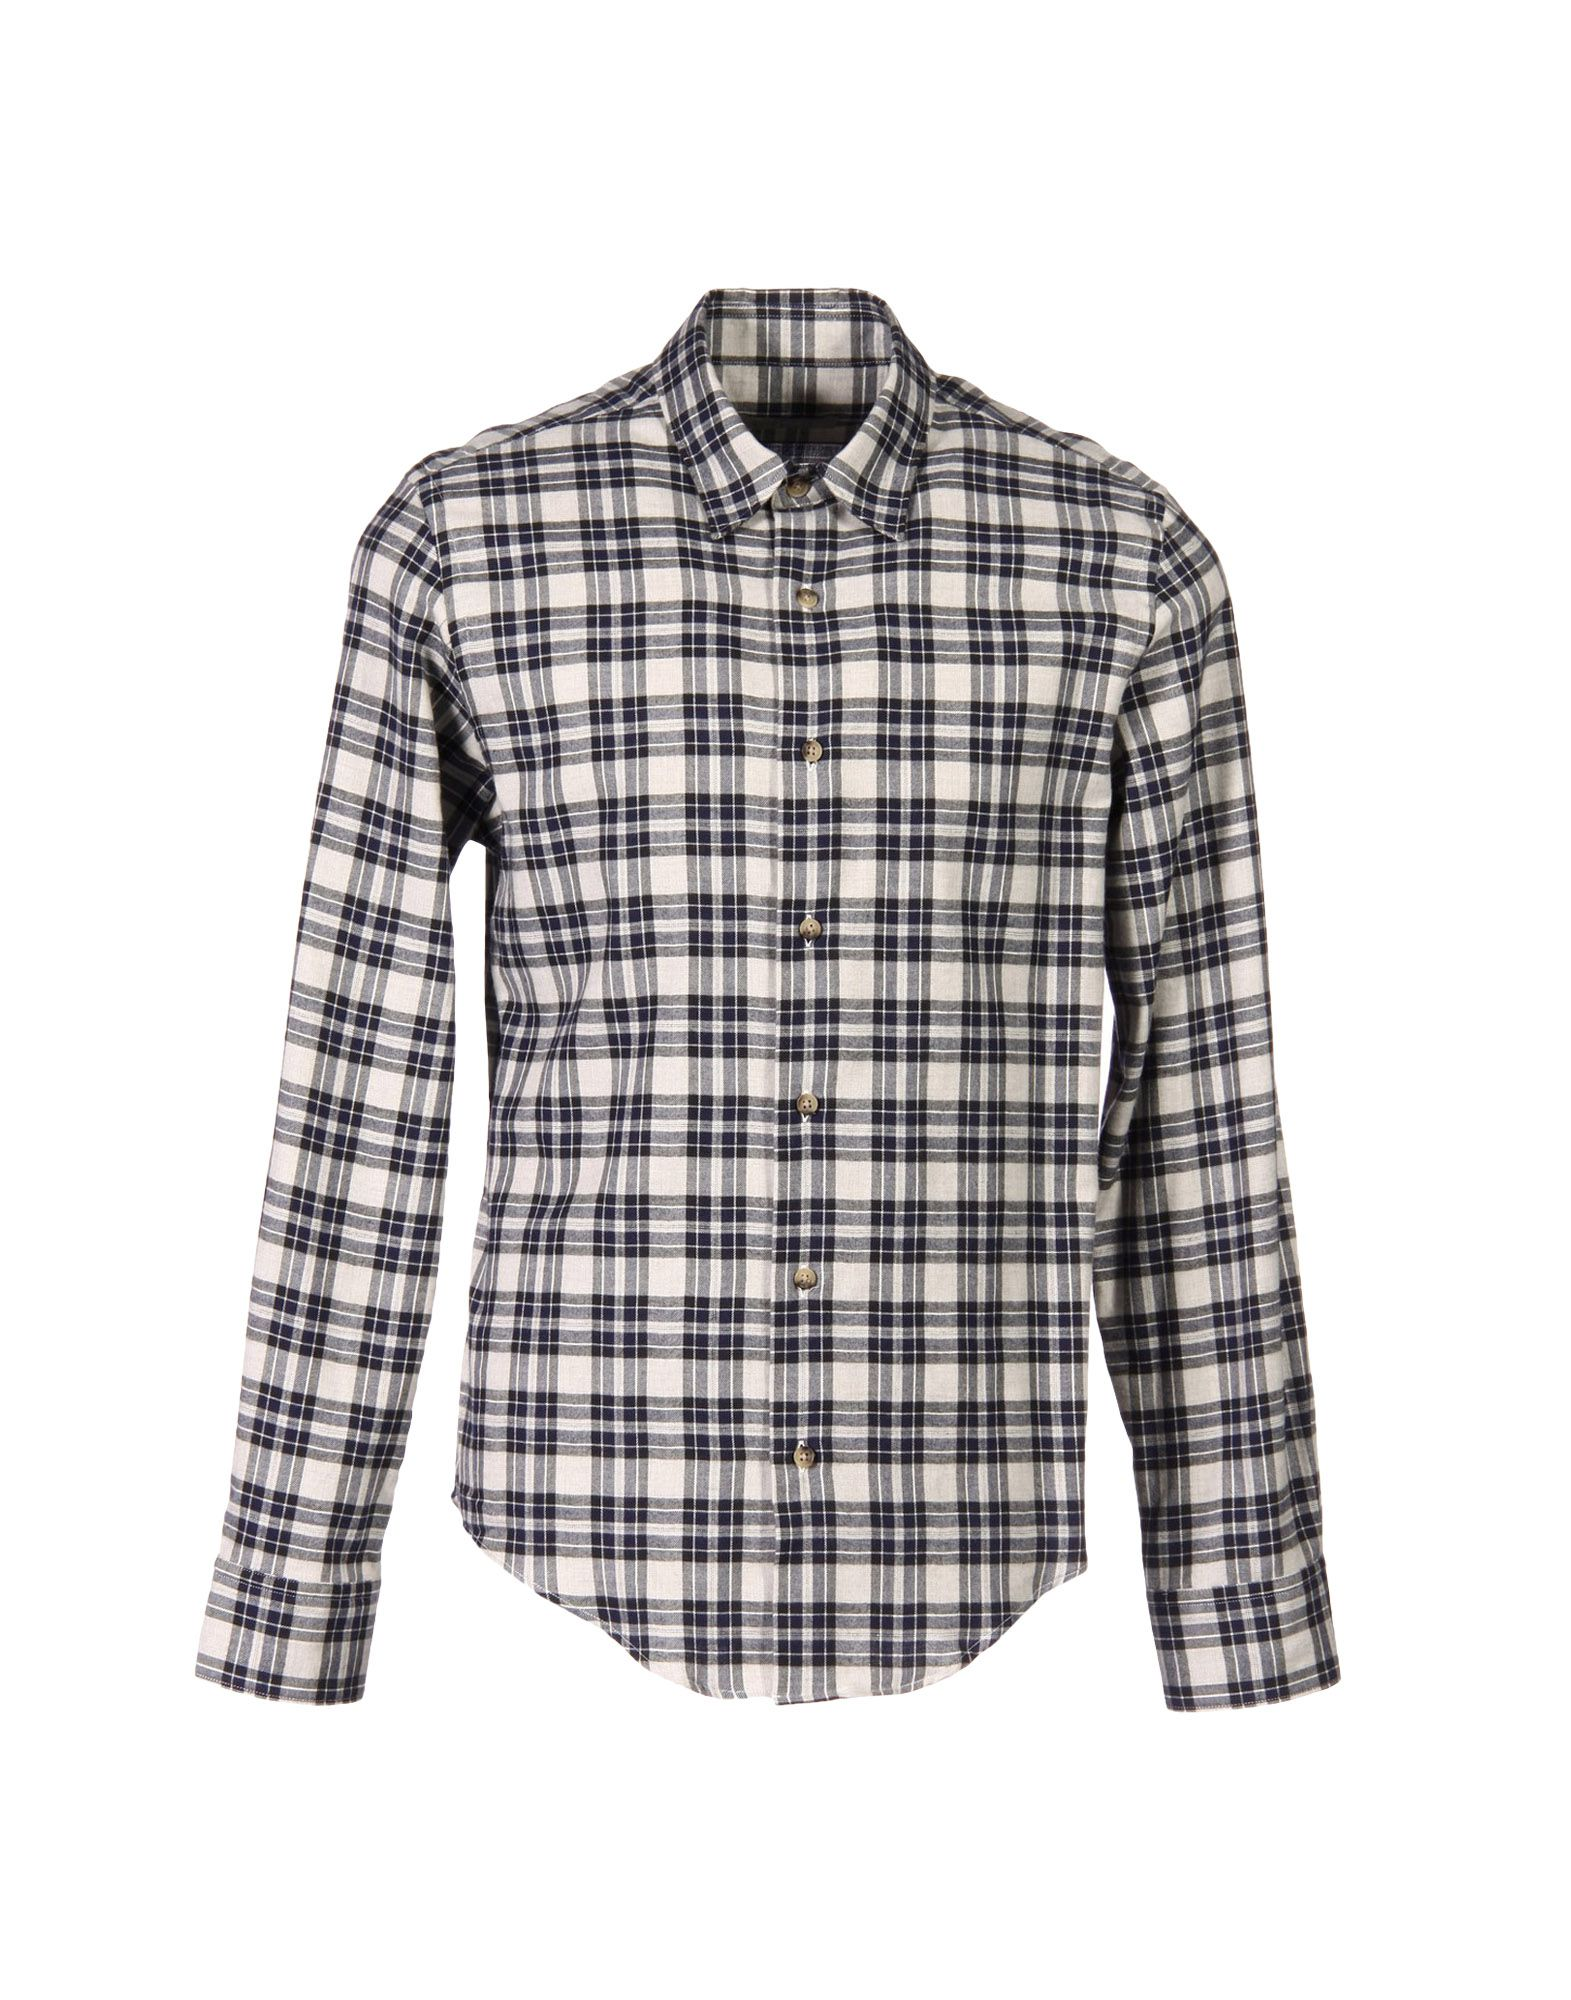 CADET Shirts in Grey